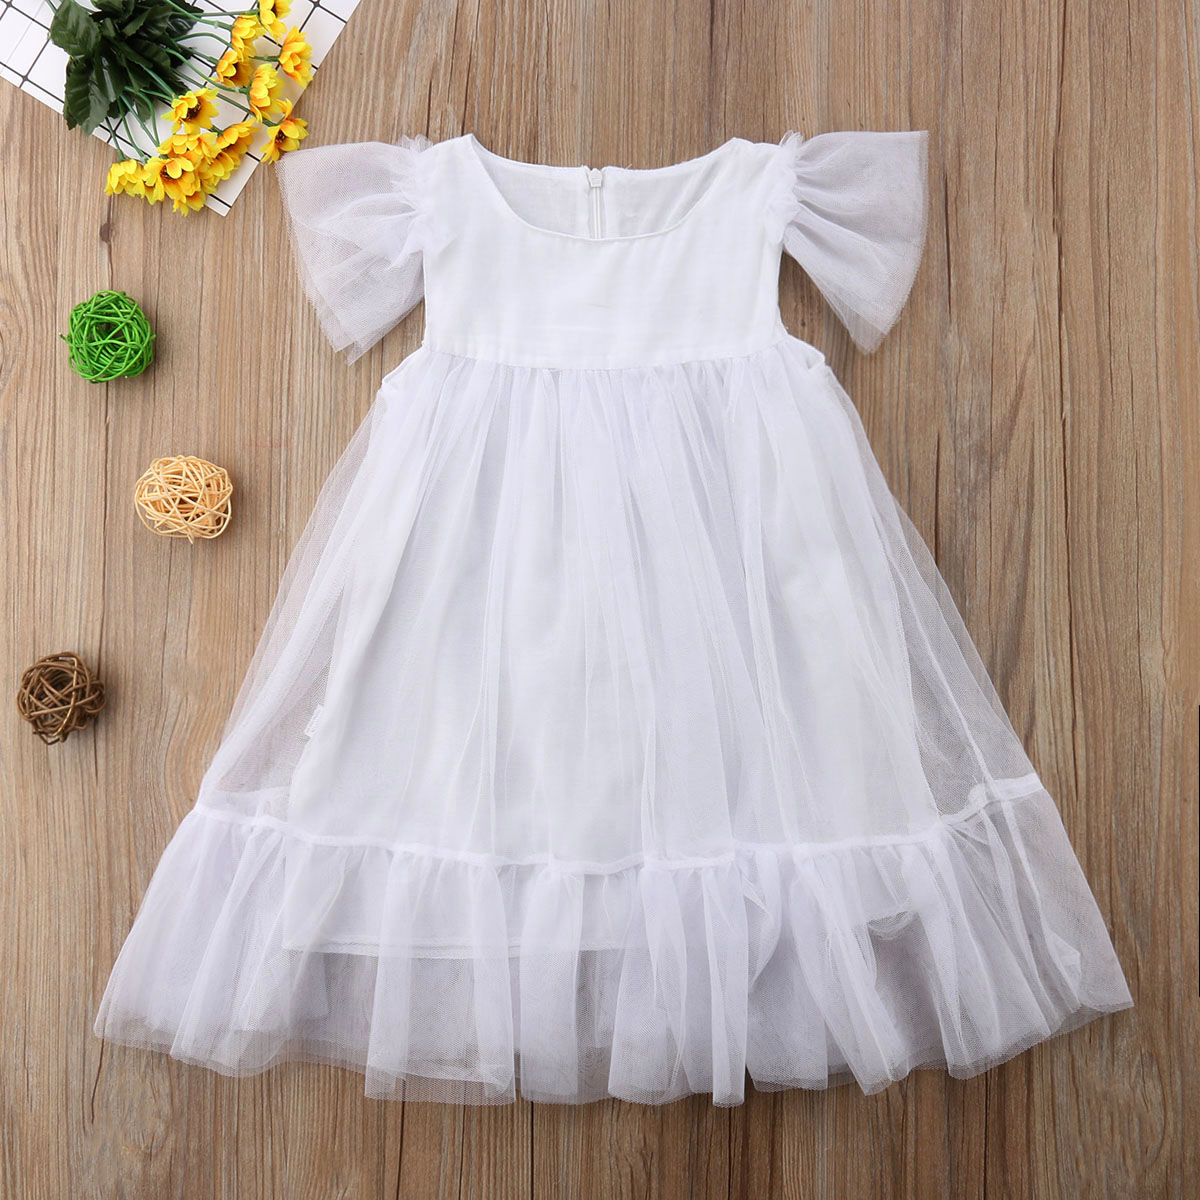 Flower Pageant Sundress Tutu Dress Floral Tulle Princess Baby Girls Dress